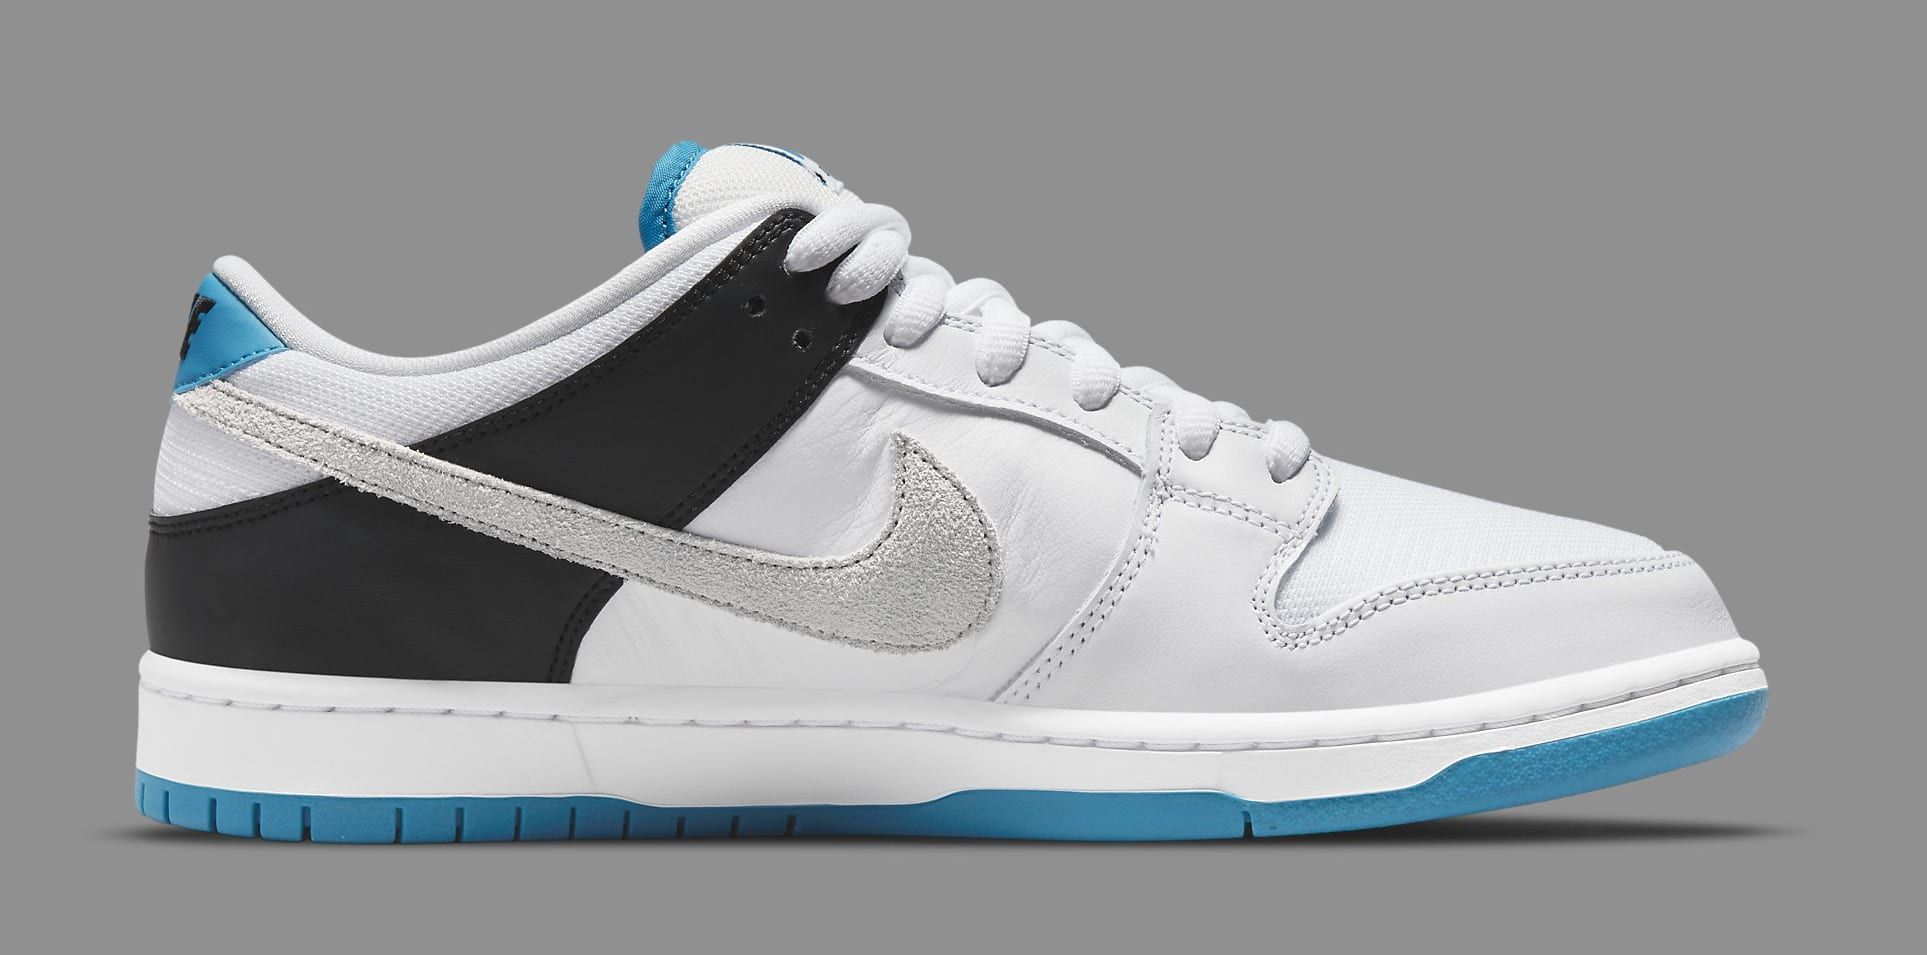 Nike SB Dunk Low 'Laser Blue' BQ6817-101 Medial